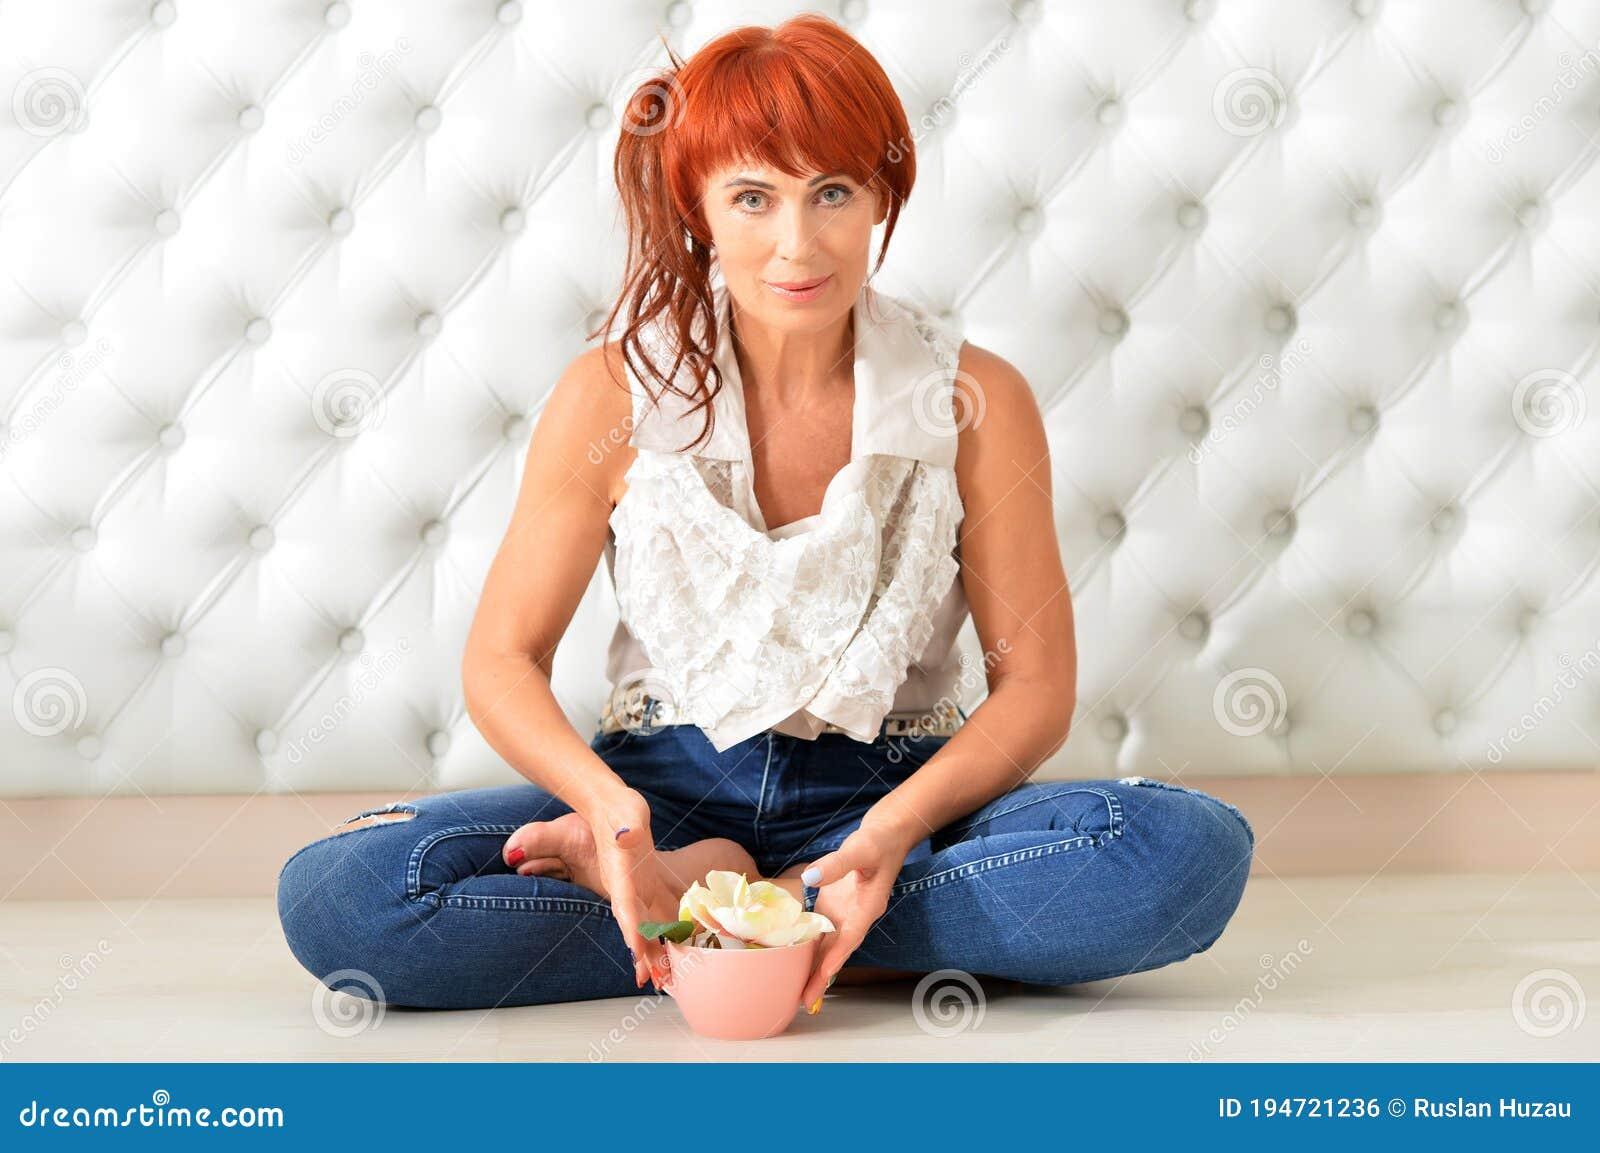 Smiling Redhead Woman Posing Stock Photo - Download Image